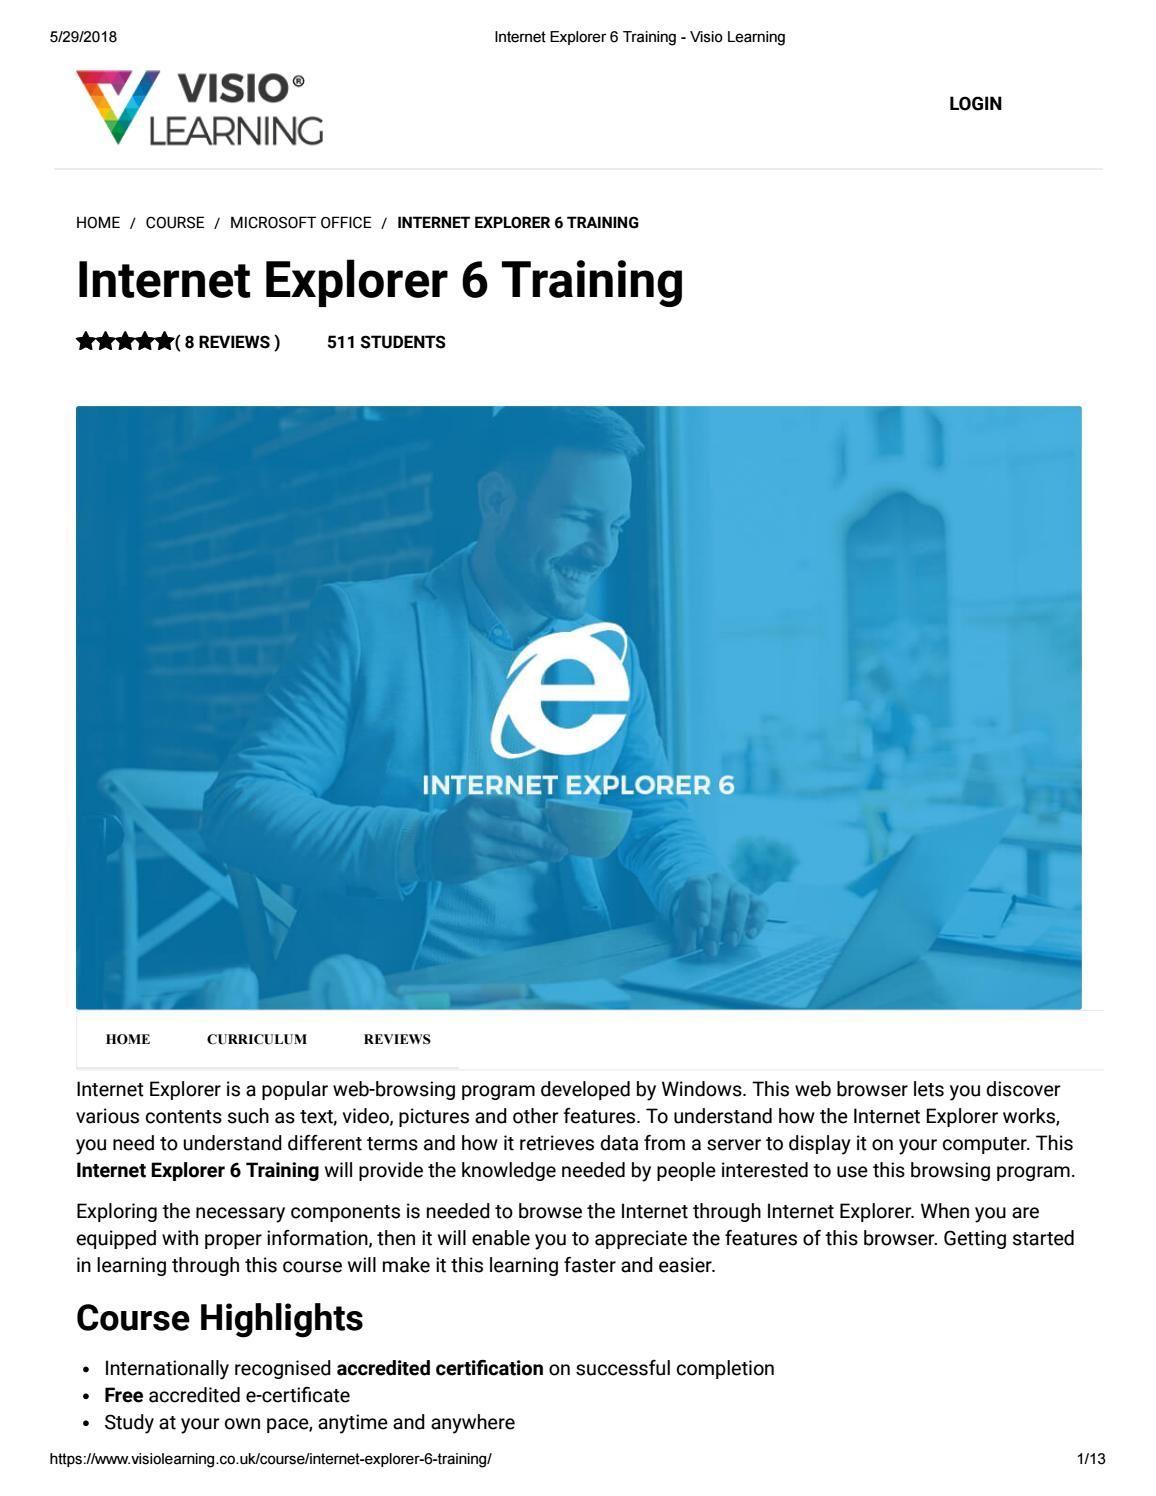 Internet Explorer 6 Training - Visio Learning | Office